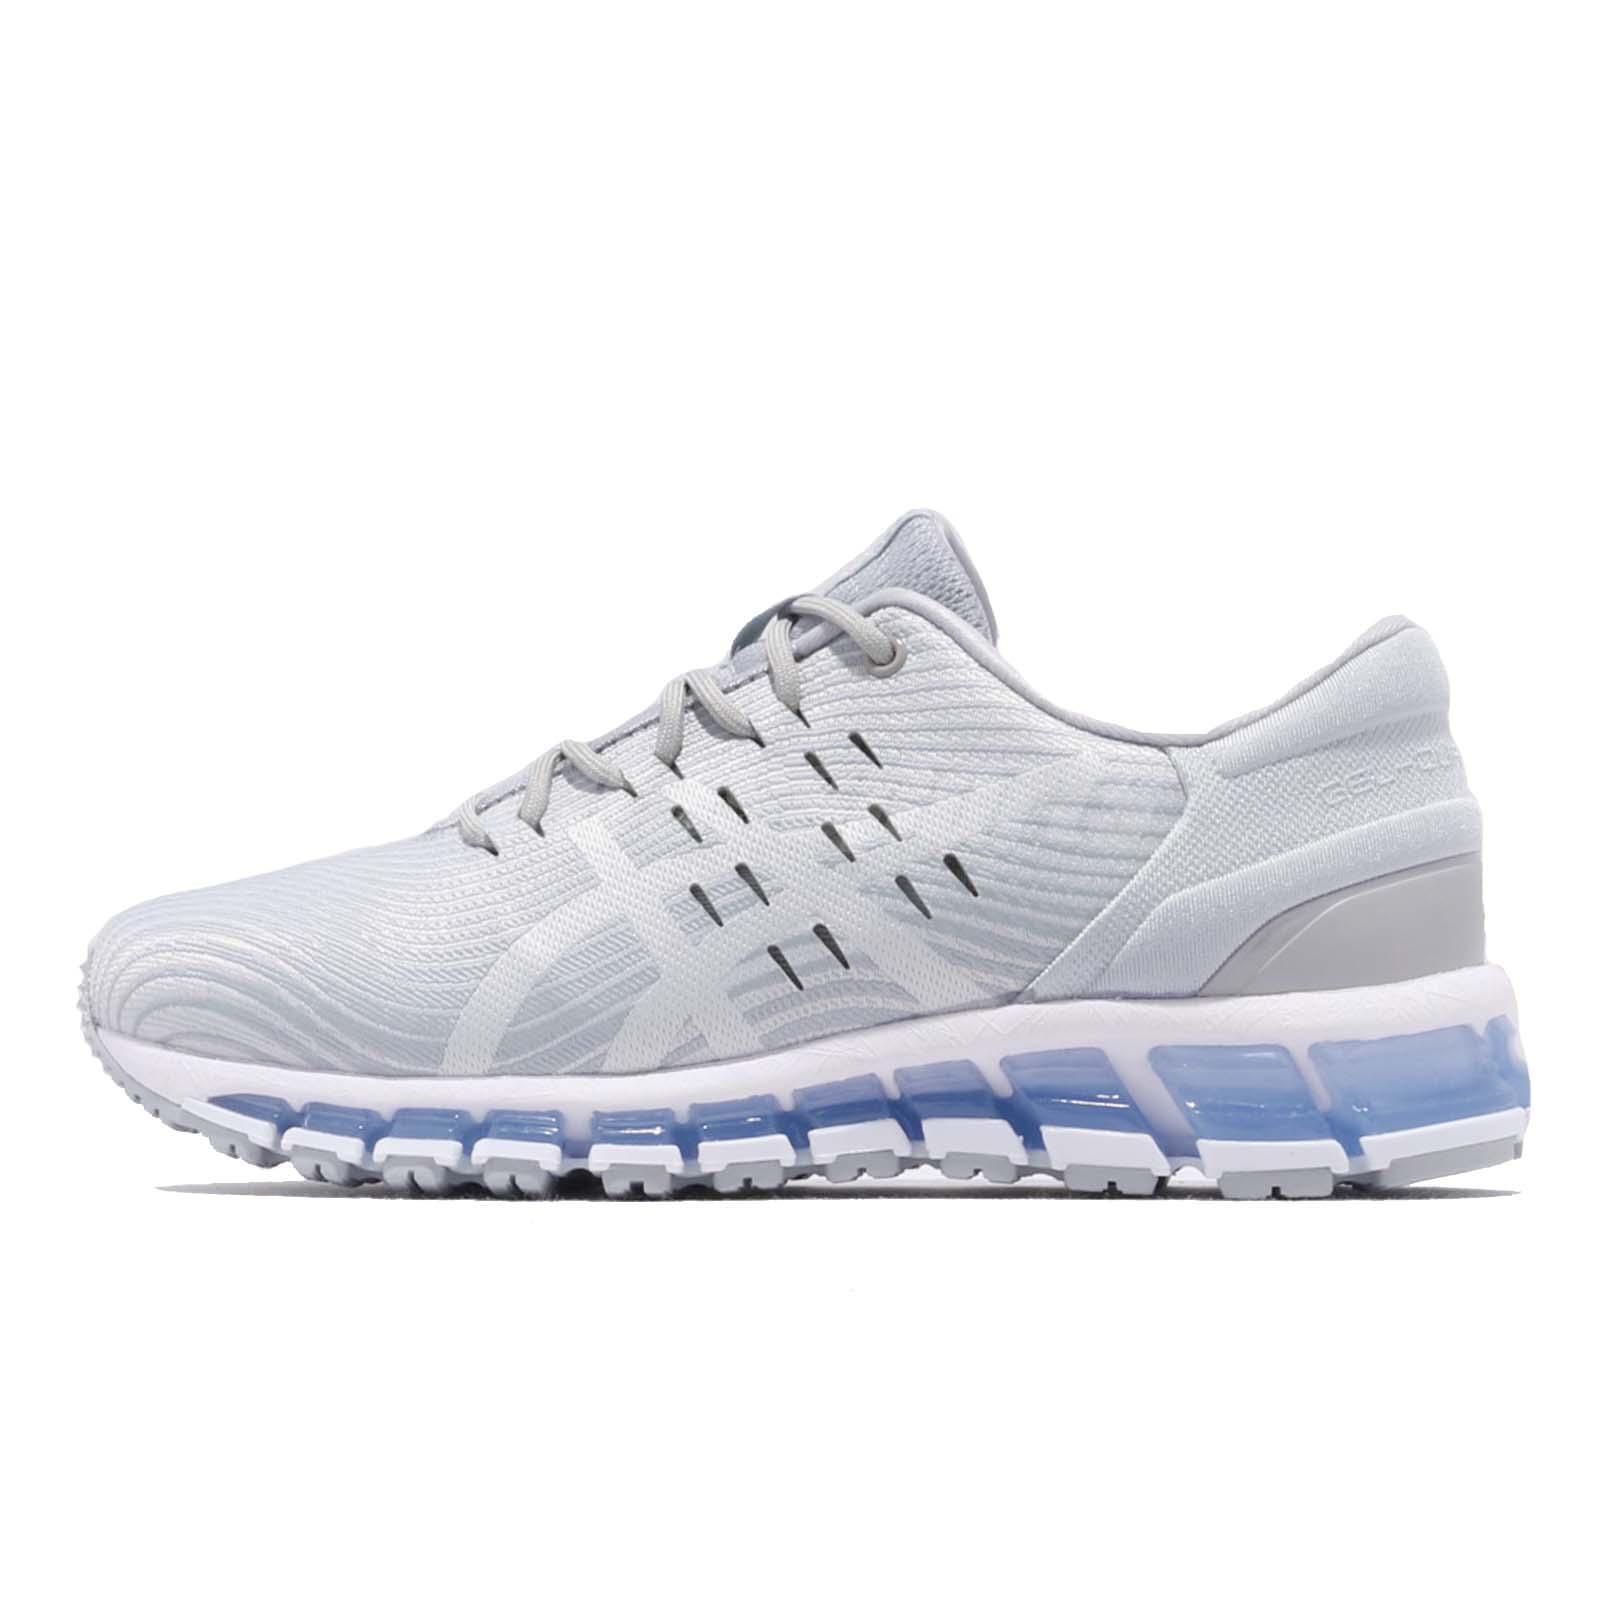 sports shoes 3ef79 6ea6d Details about Asics Gel Quantum 360 4 Glacier Grey Women Running Shoes  Sneakers 1022A029-022